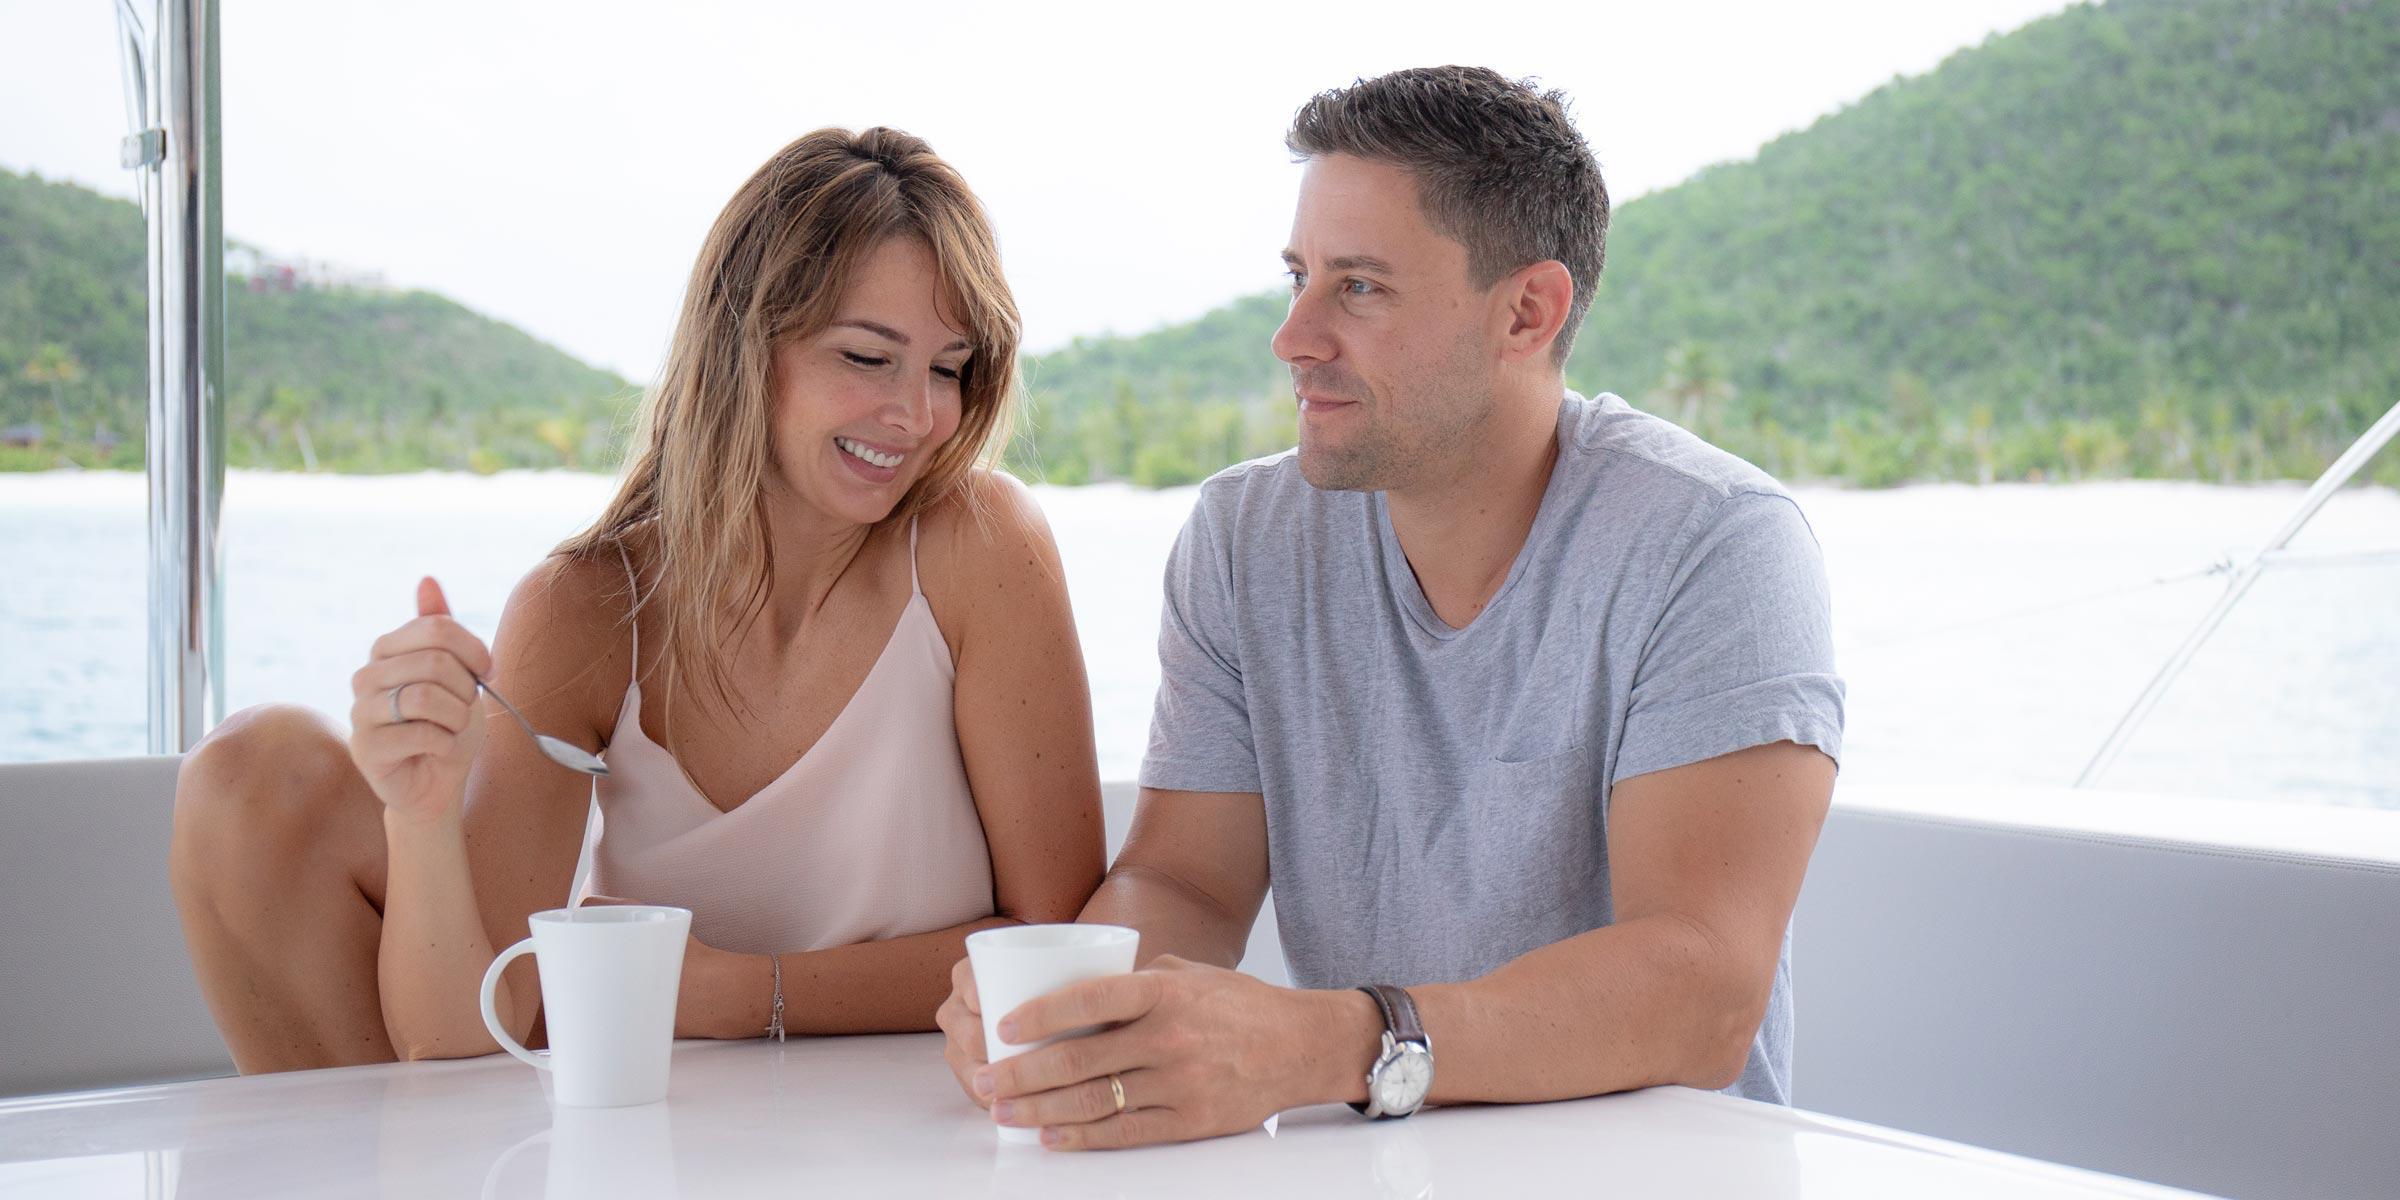 Couple enjoying their morning coffee in ceramic cups